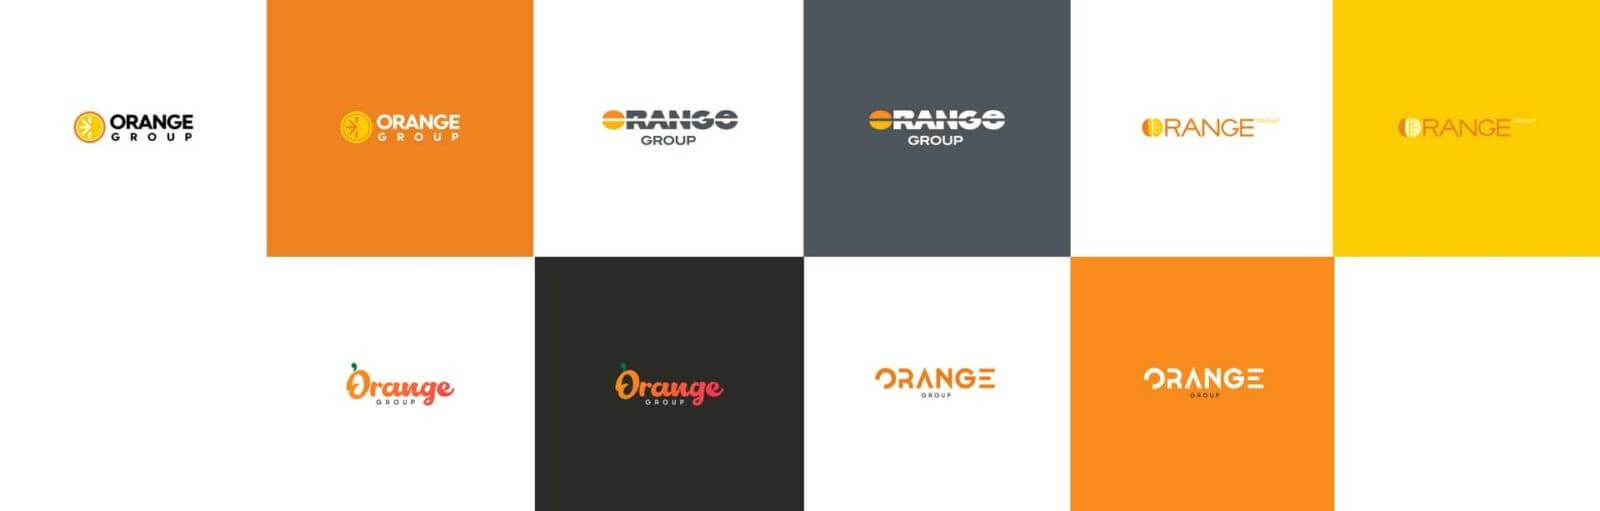 логотип группы компаний. Эскизы и версии логотипа